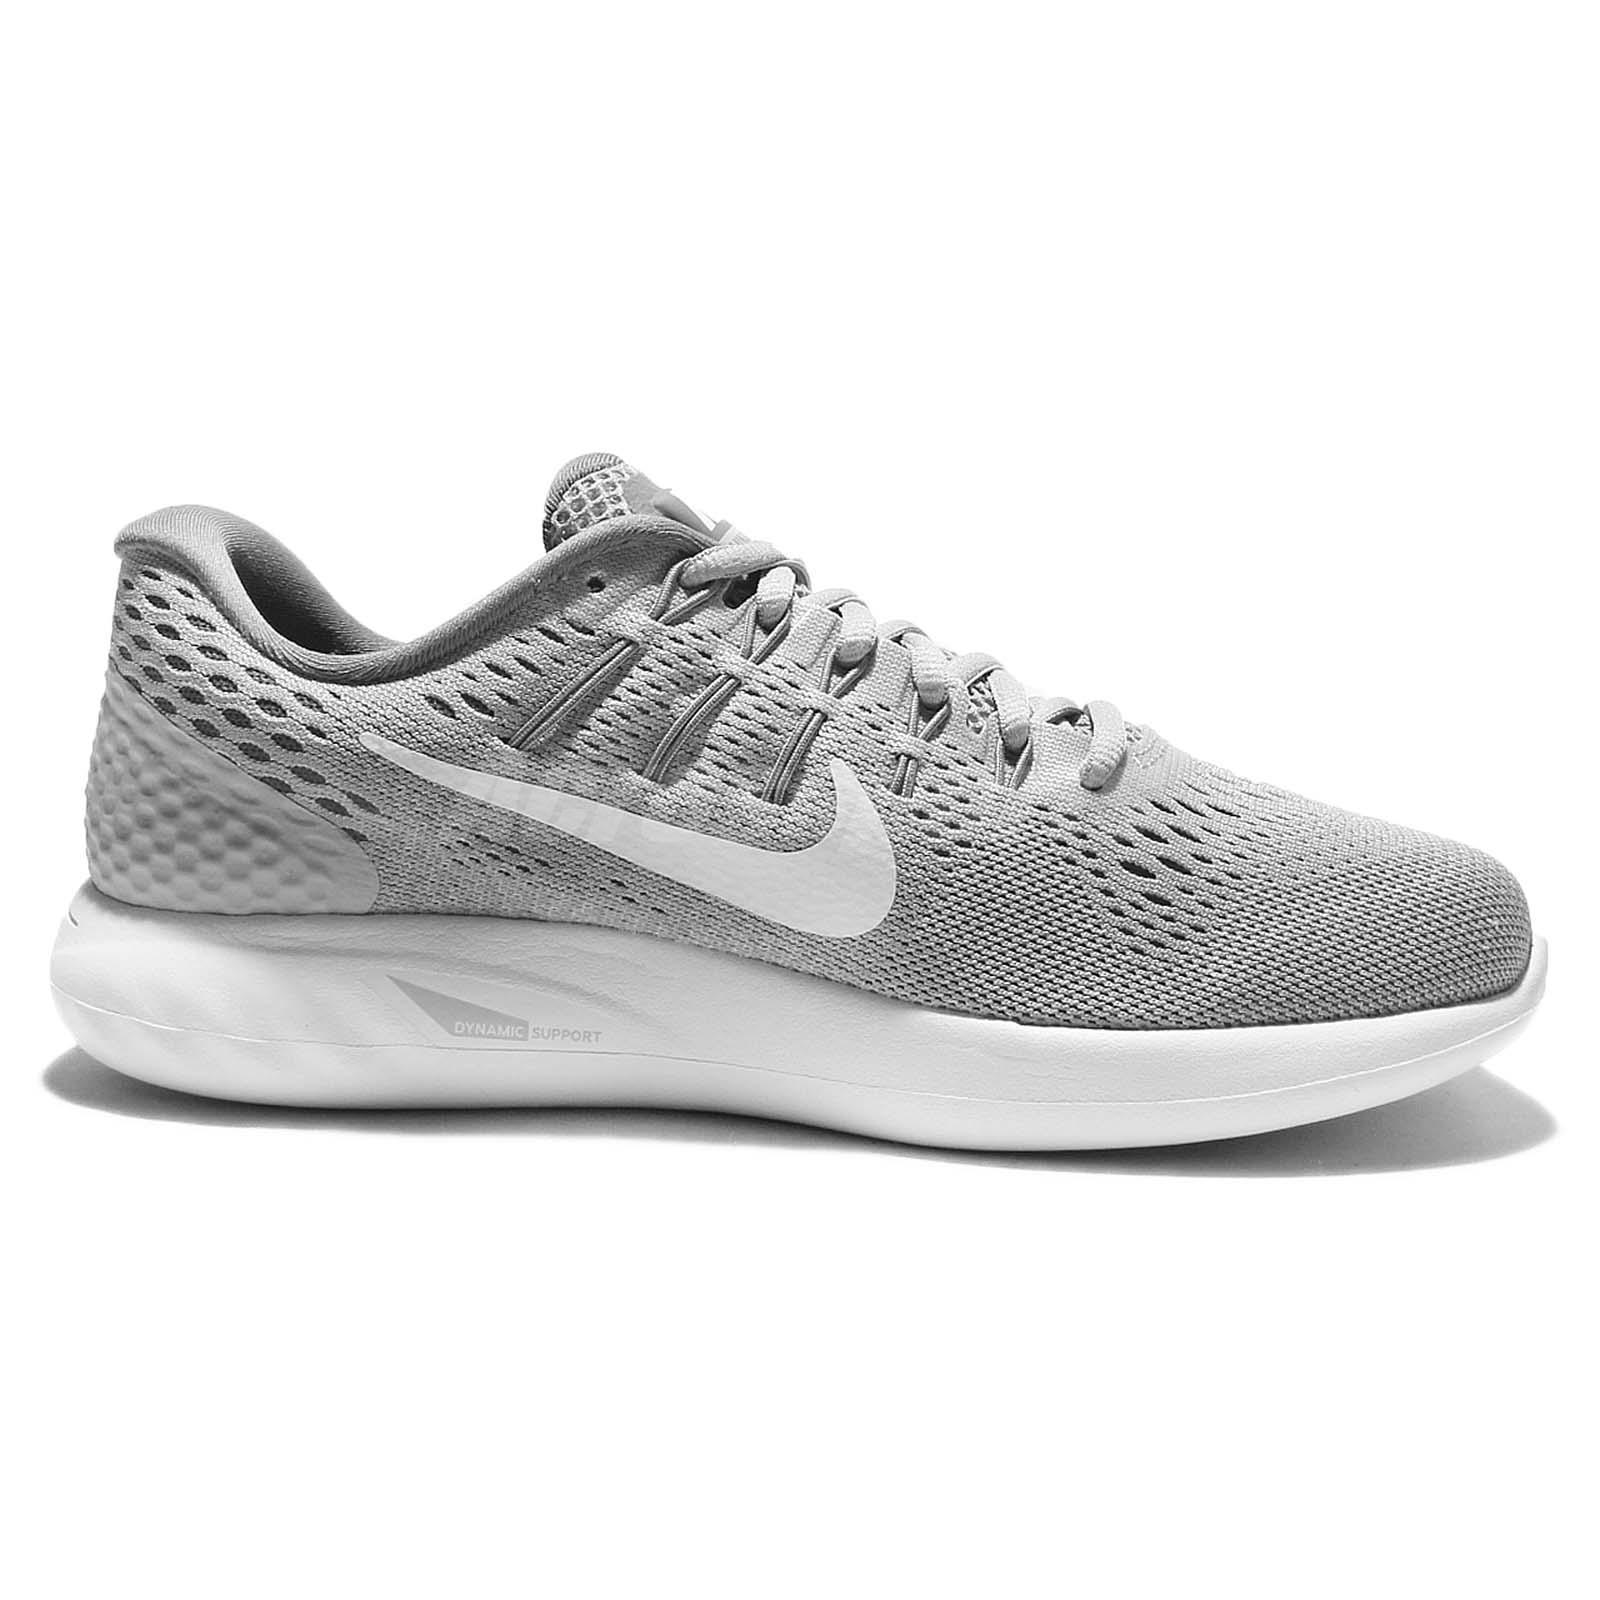 pas cher Finishline Nike Lunarglide 8 Gris SAST en ligne vente Frais discount achat OgINF3